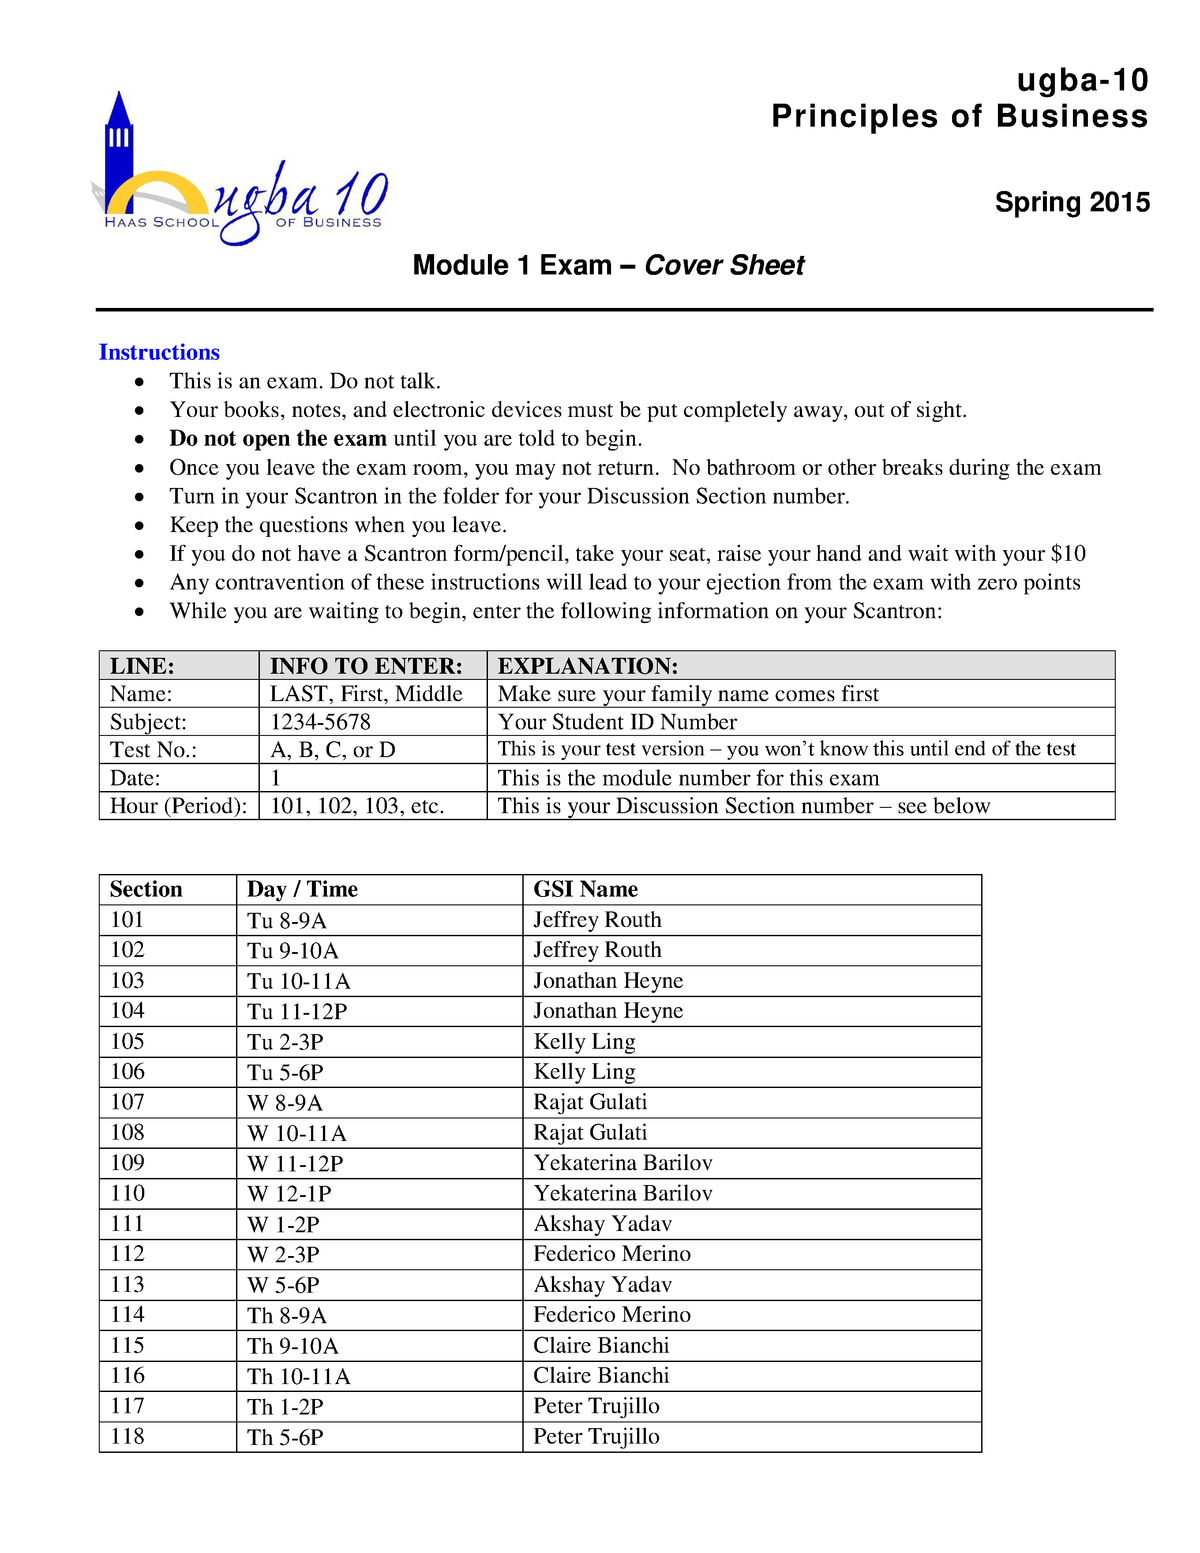 Previ Capsim Modular Exam | Asdela